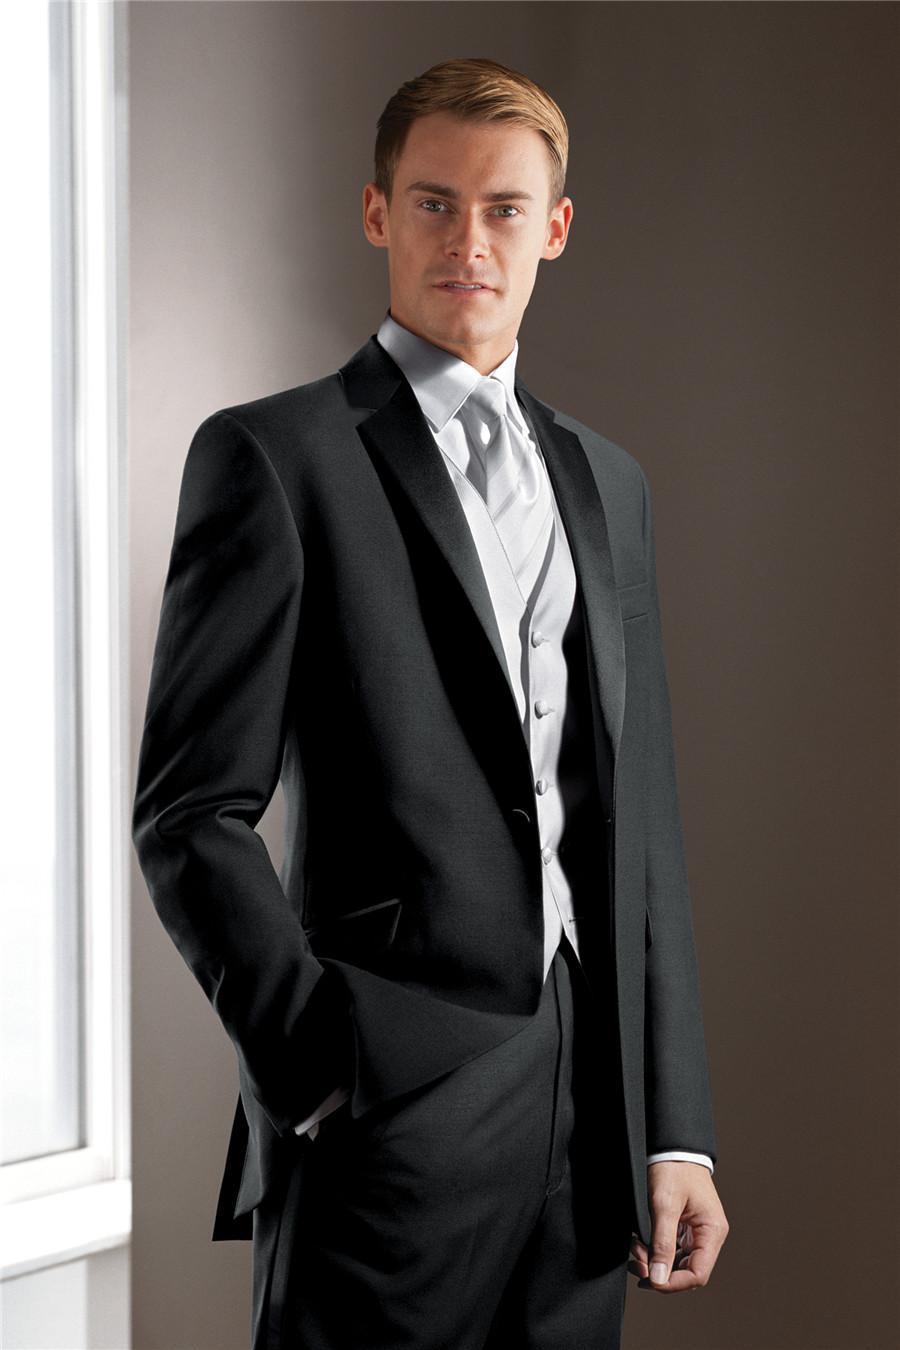 the latest high quality grey gun collar best man suit/groom wedding ...